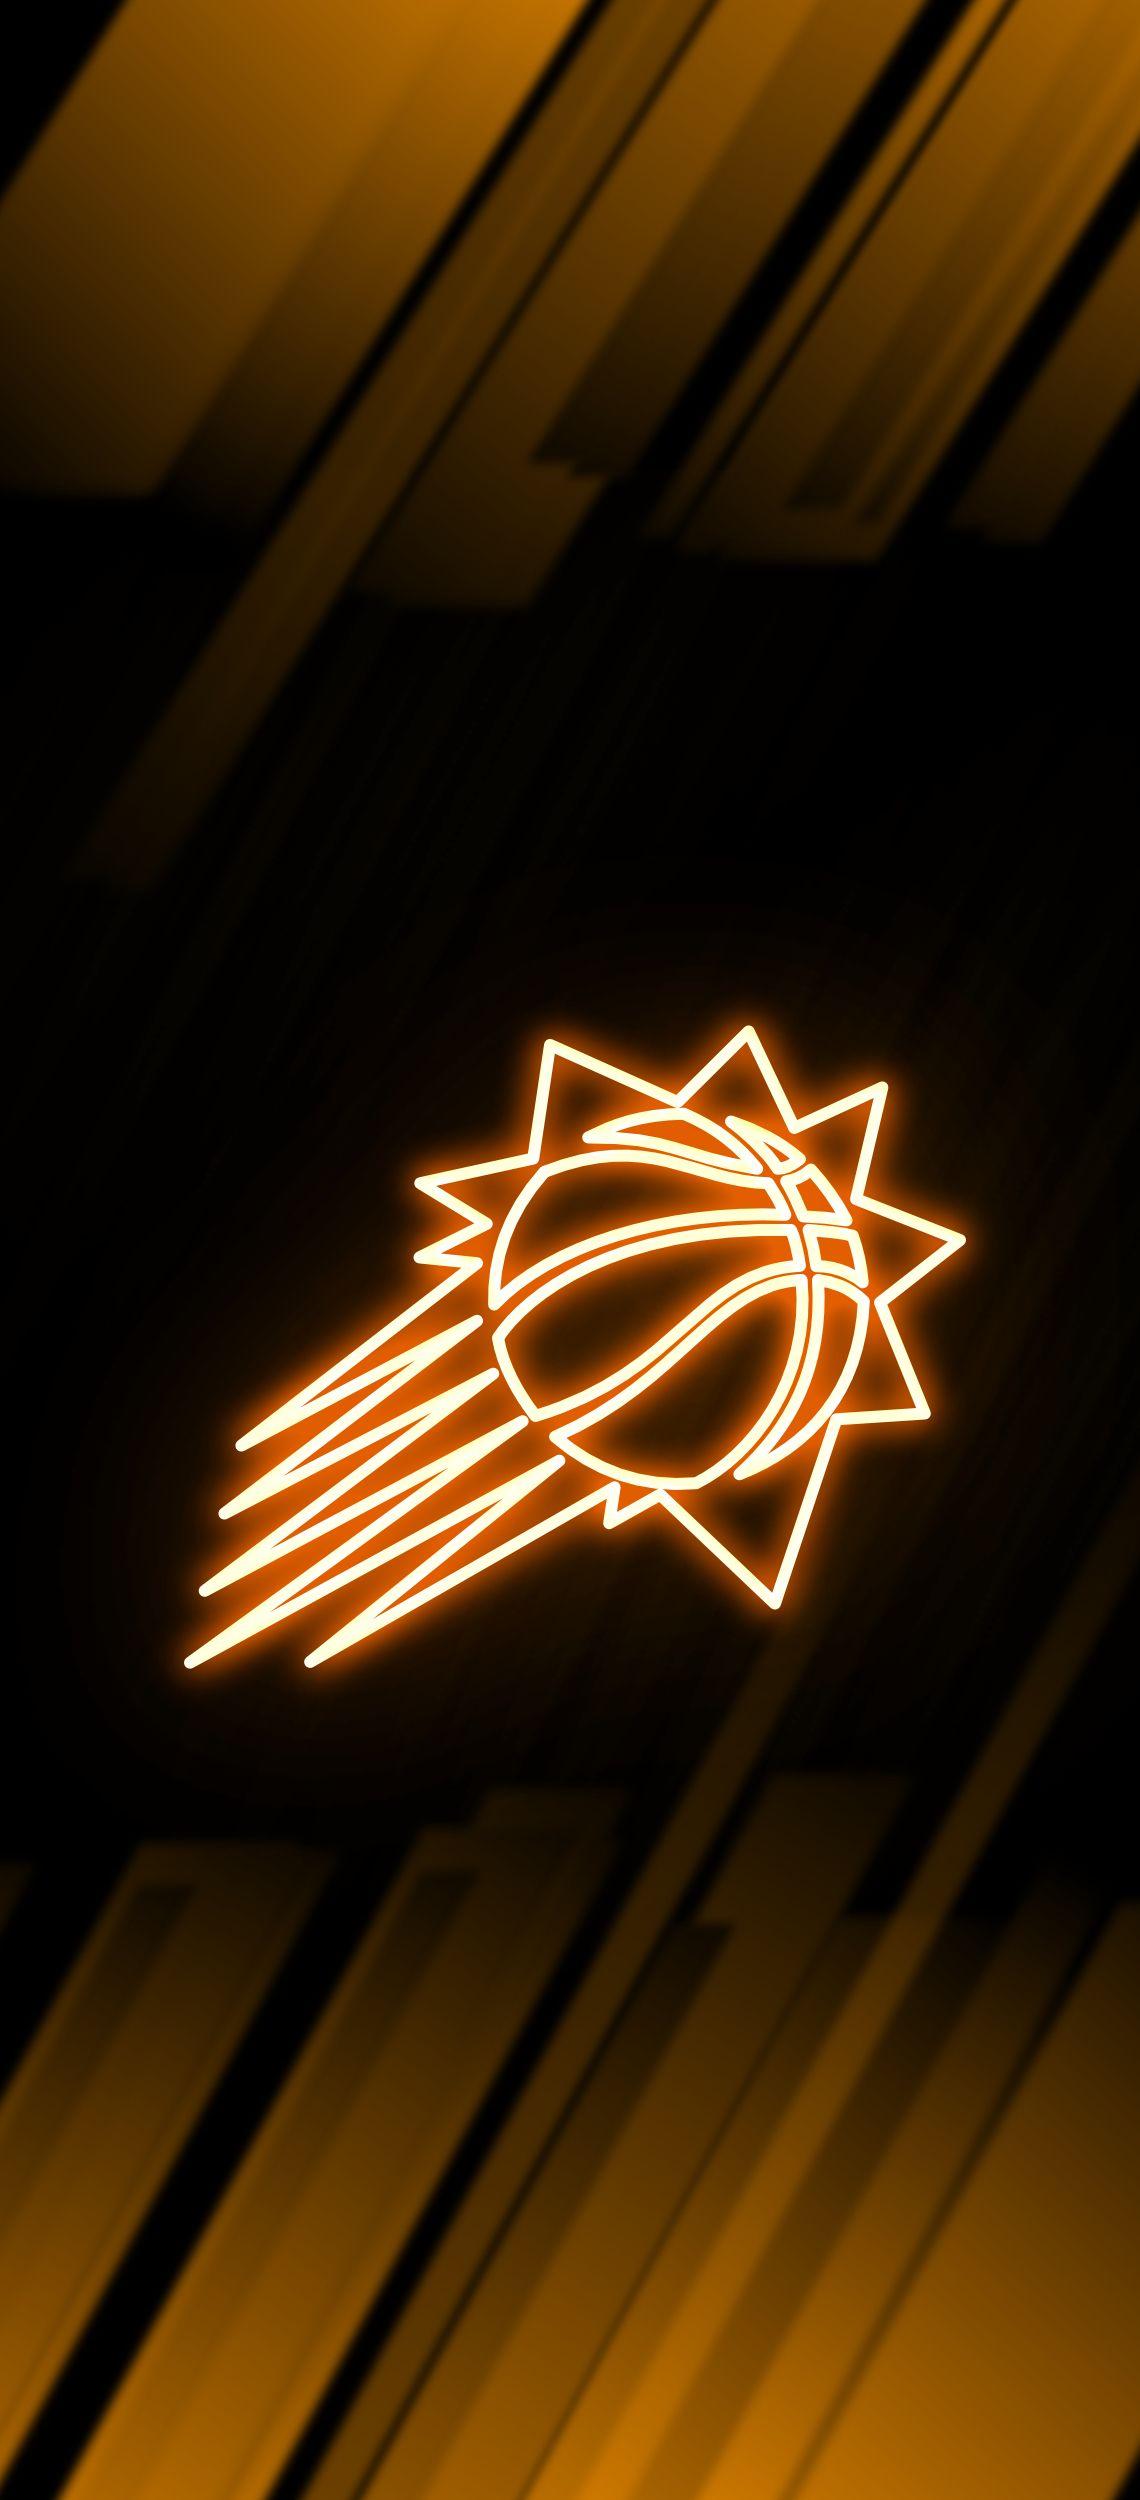 39 Phoenix Suns ideas phoenix suns nba players nba 1140x2500